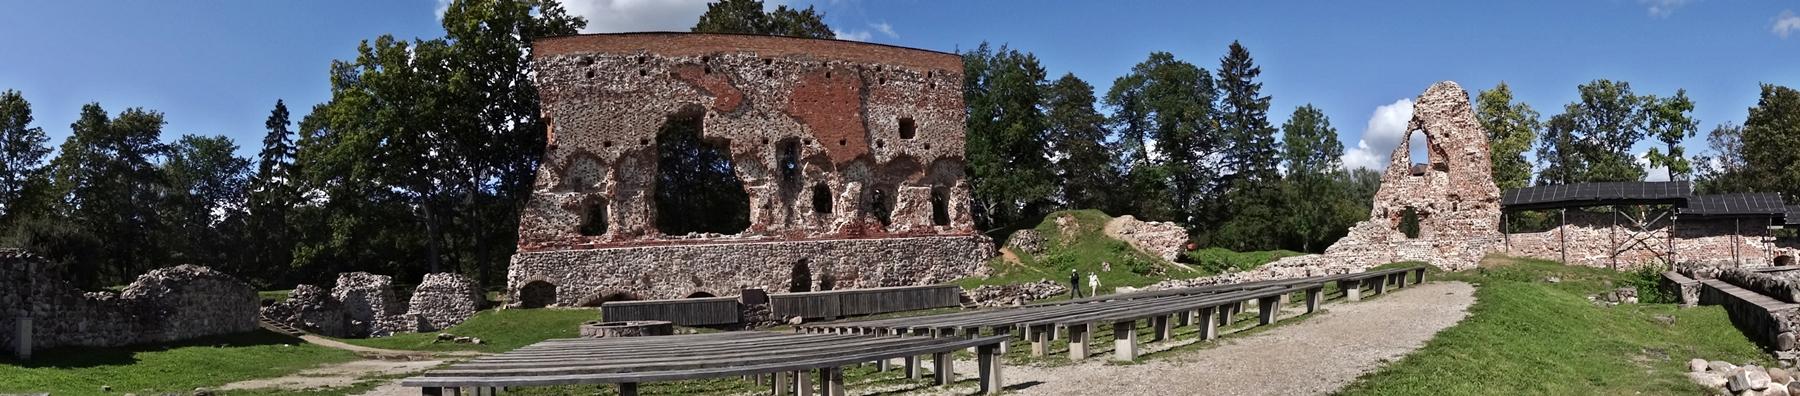 Viljandi - Kasteel van de Orde